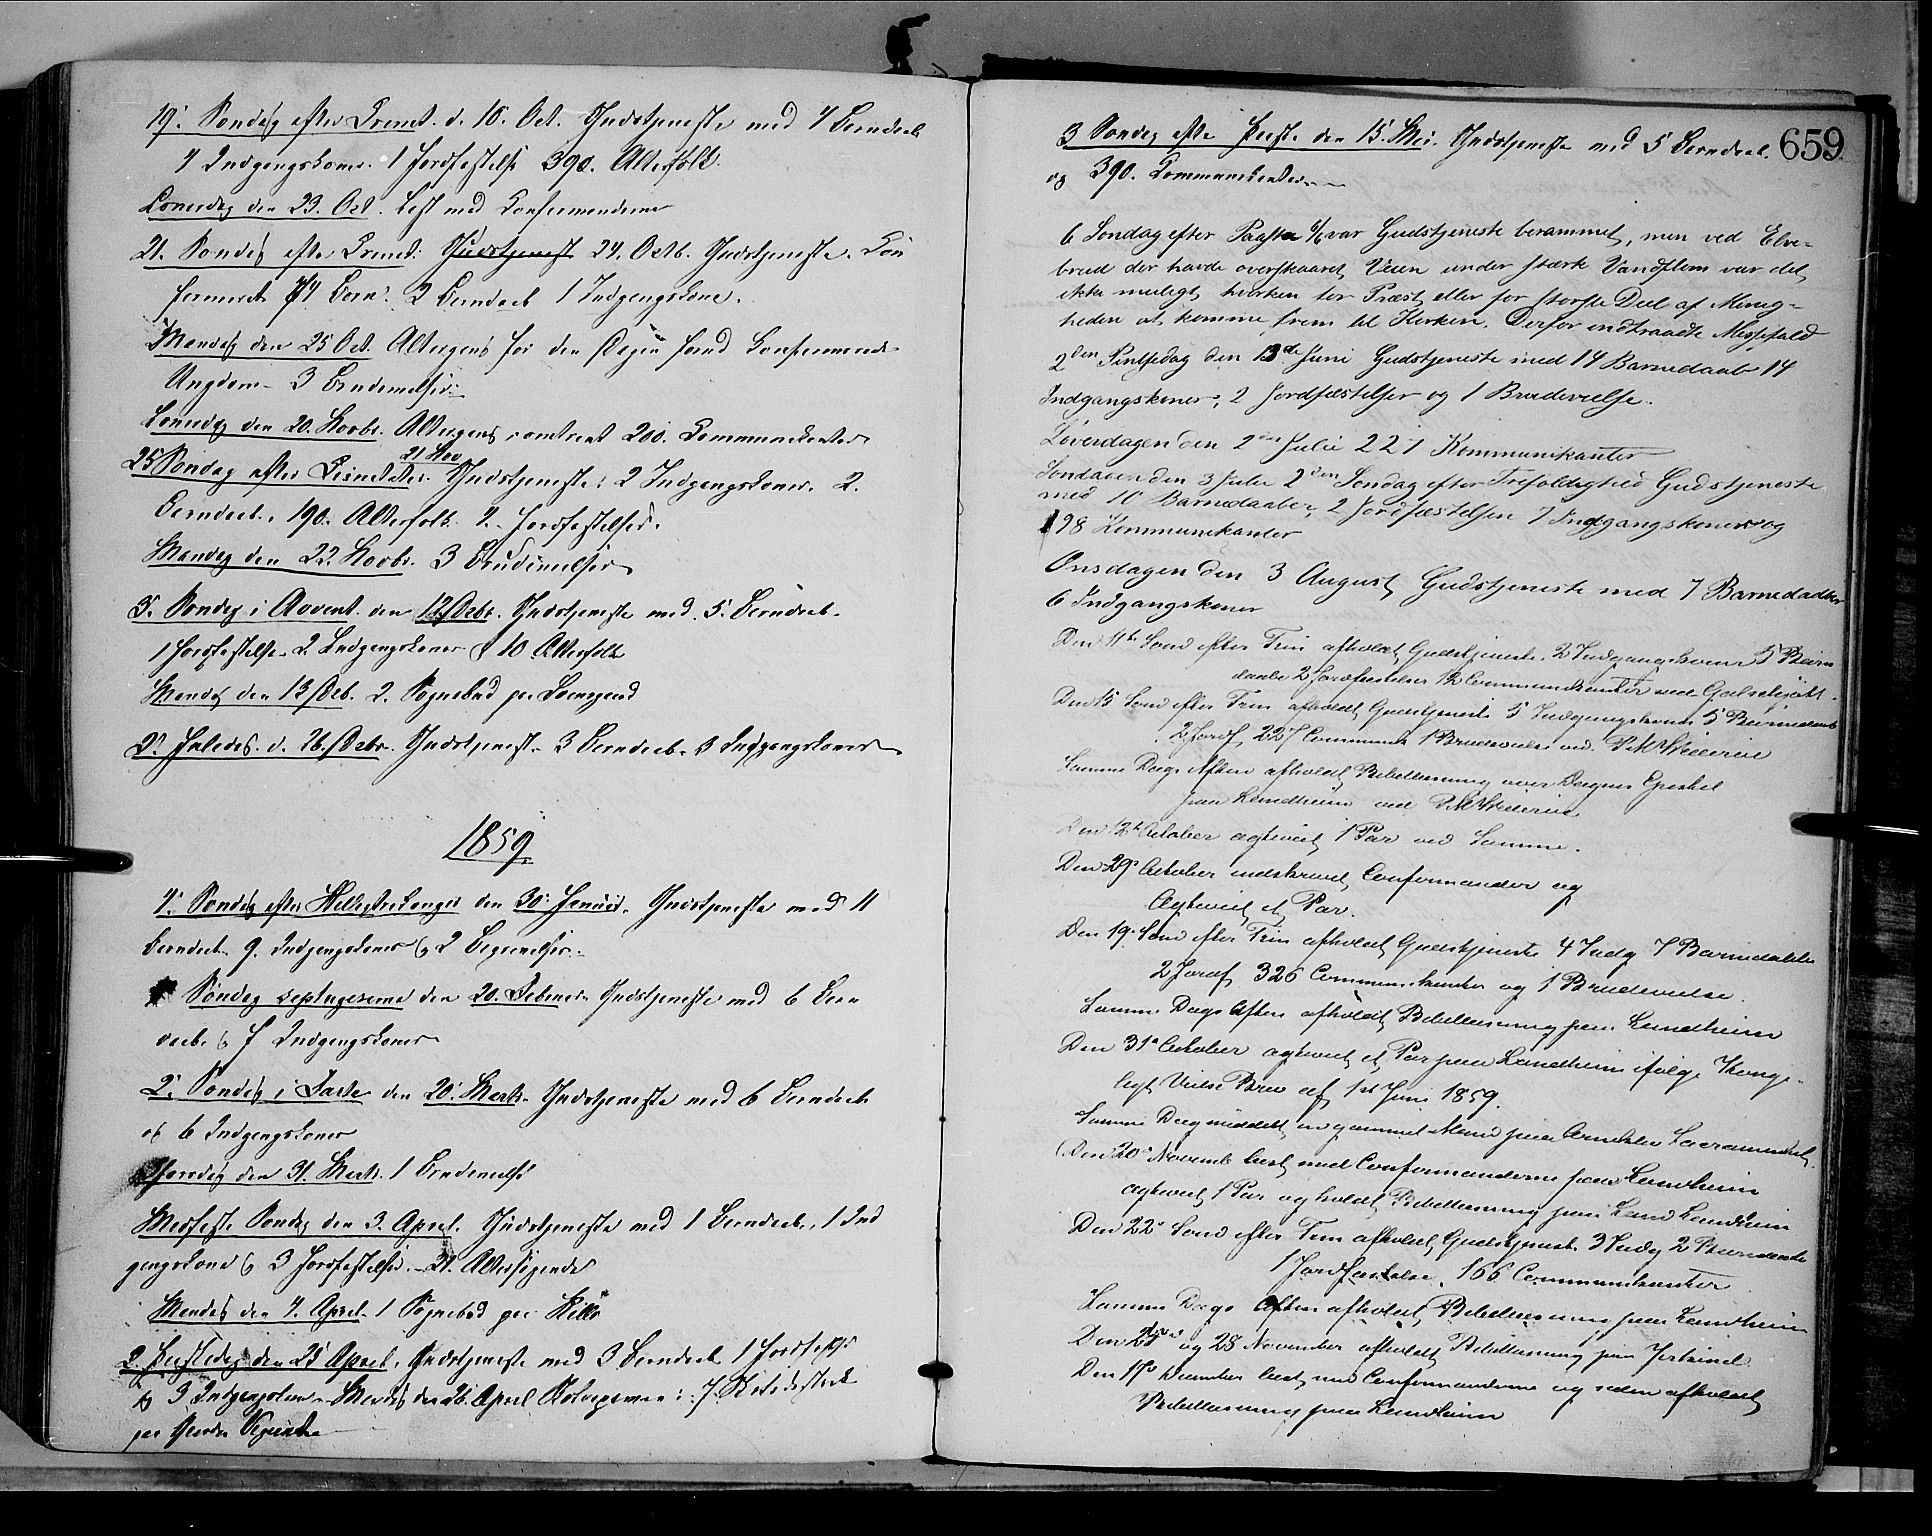 SAH, Dovre prestekontor, Ministerialbok nr. 1, 1854-1878, s. 659